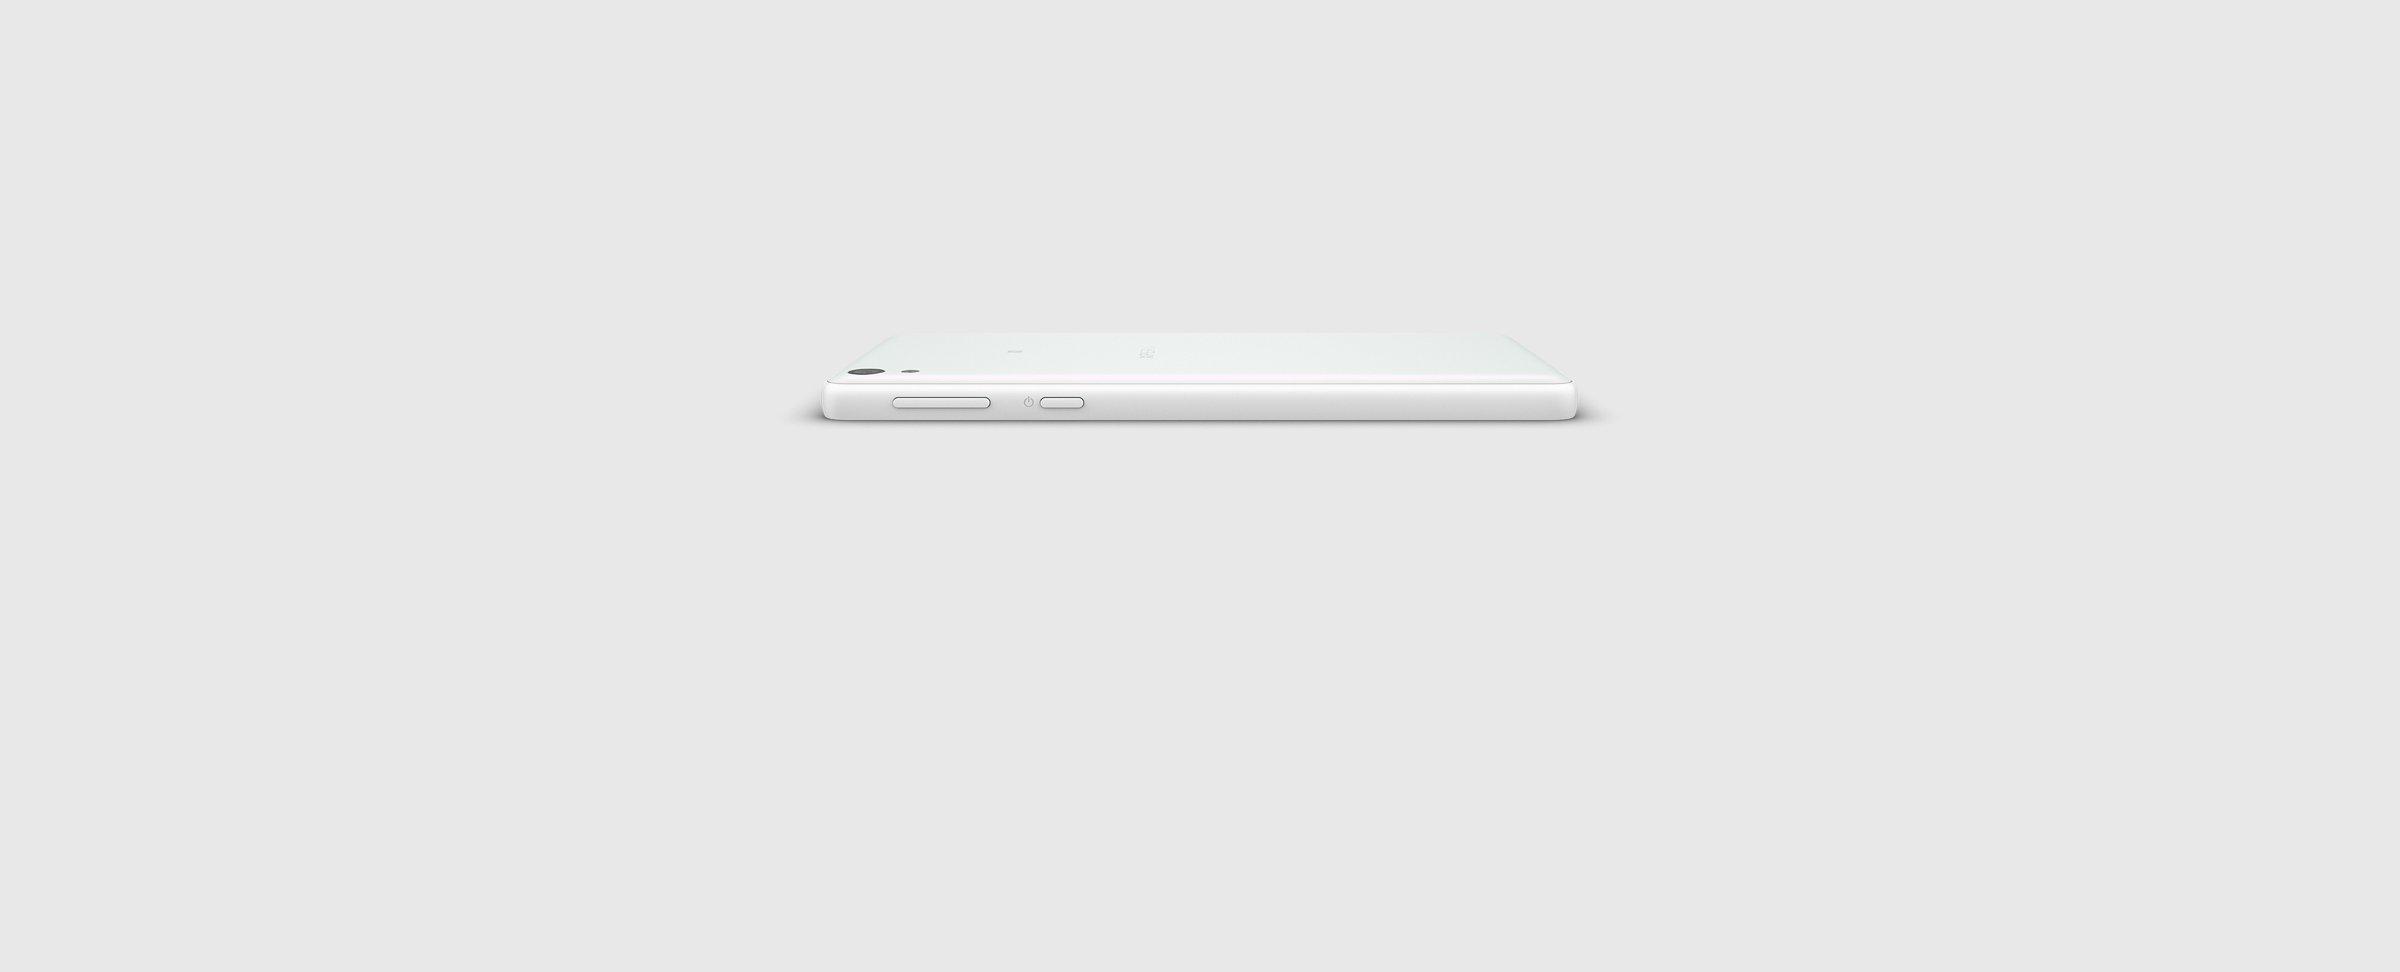 Sony Xperia E5 Smartphone Review - NotebookCheck net Reviews